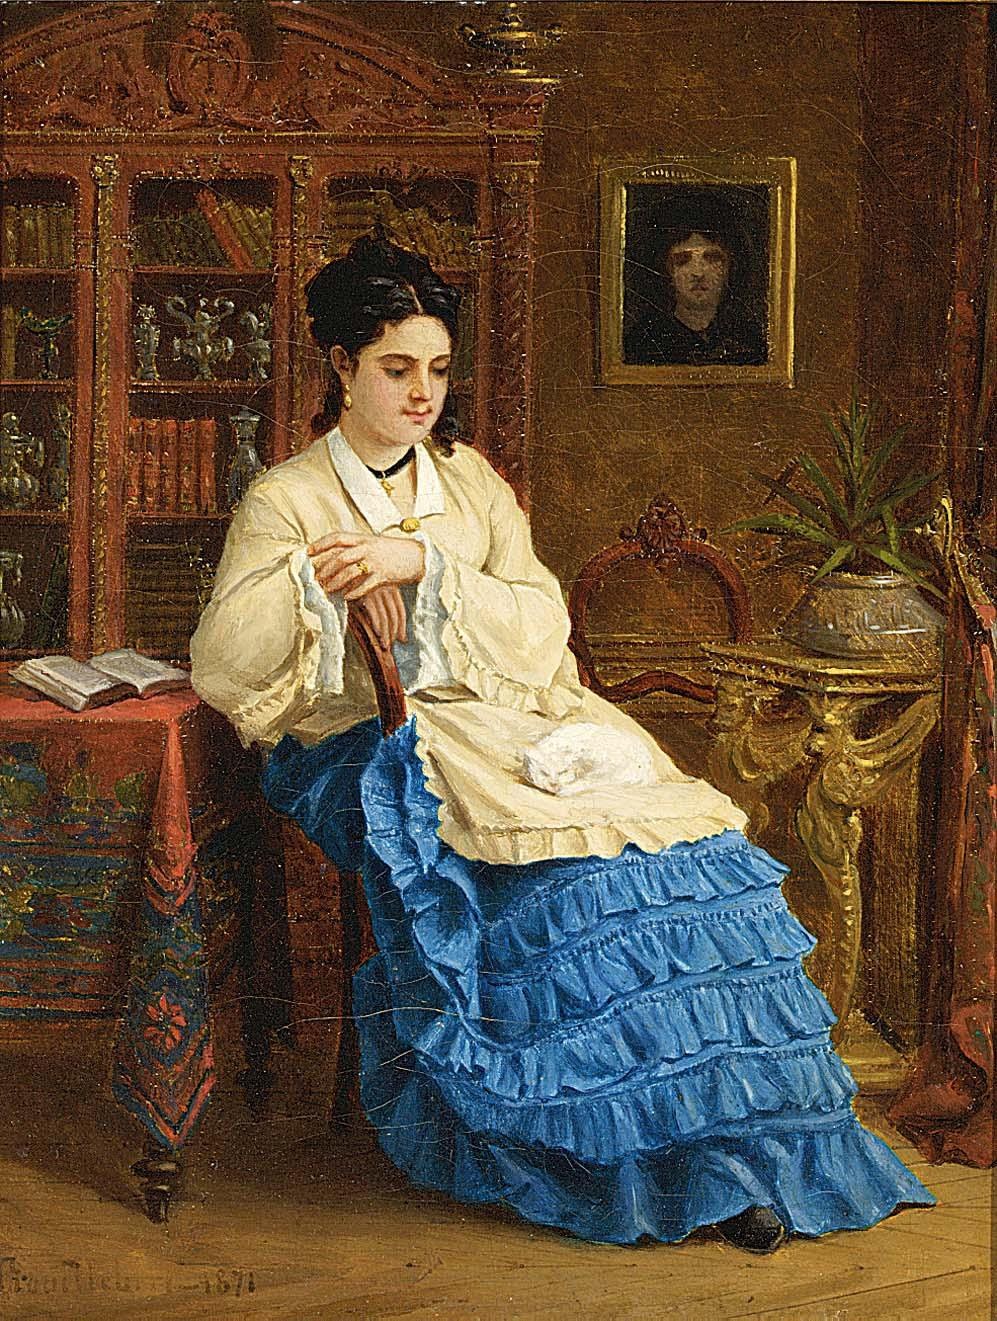 Femme en robe bleue revant by Paul Desire Trouillebert-French Painting